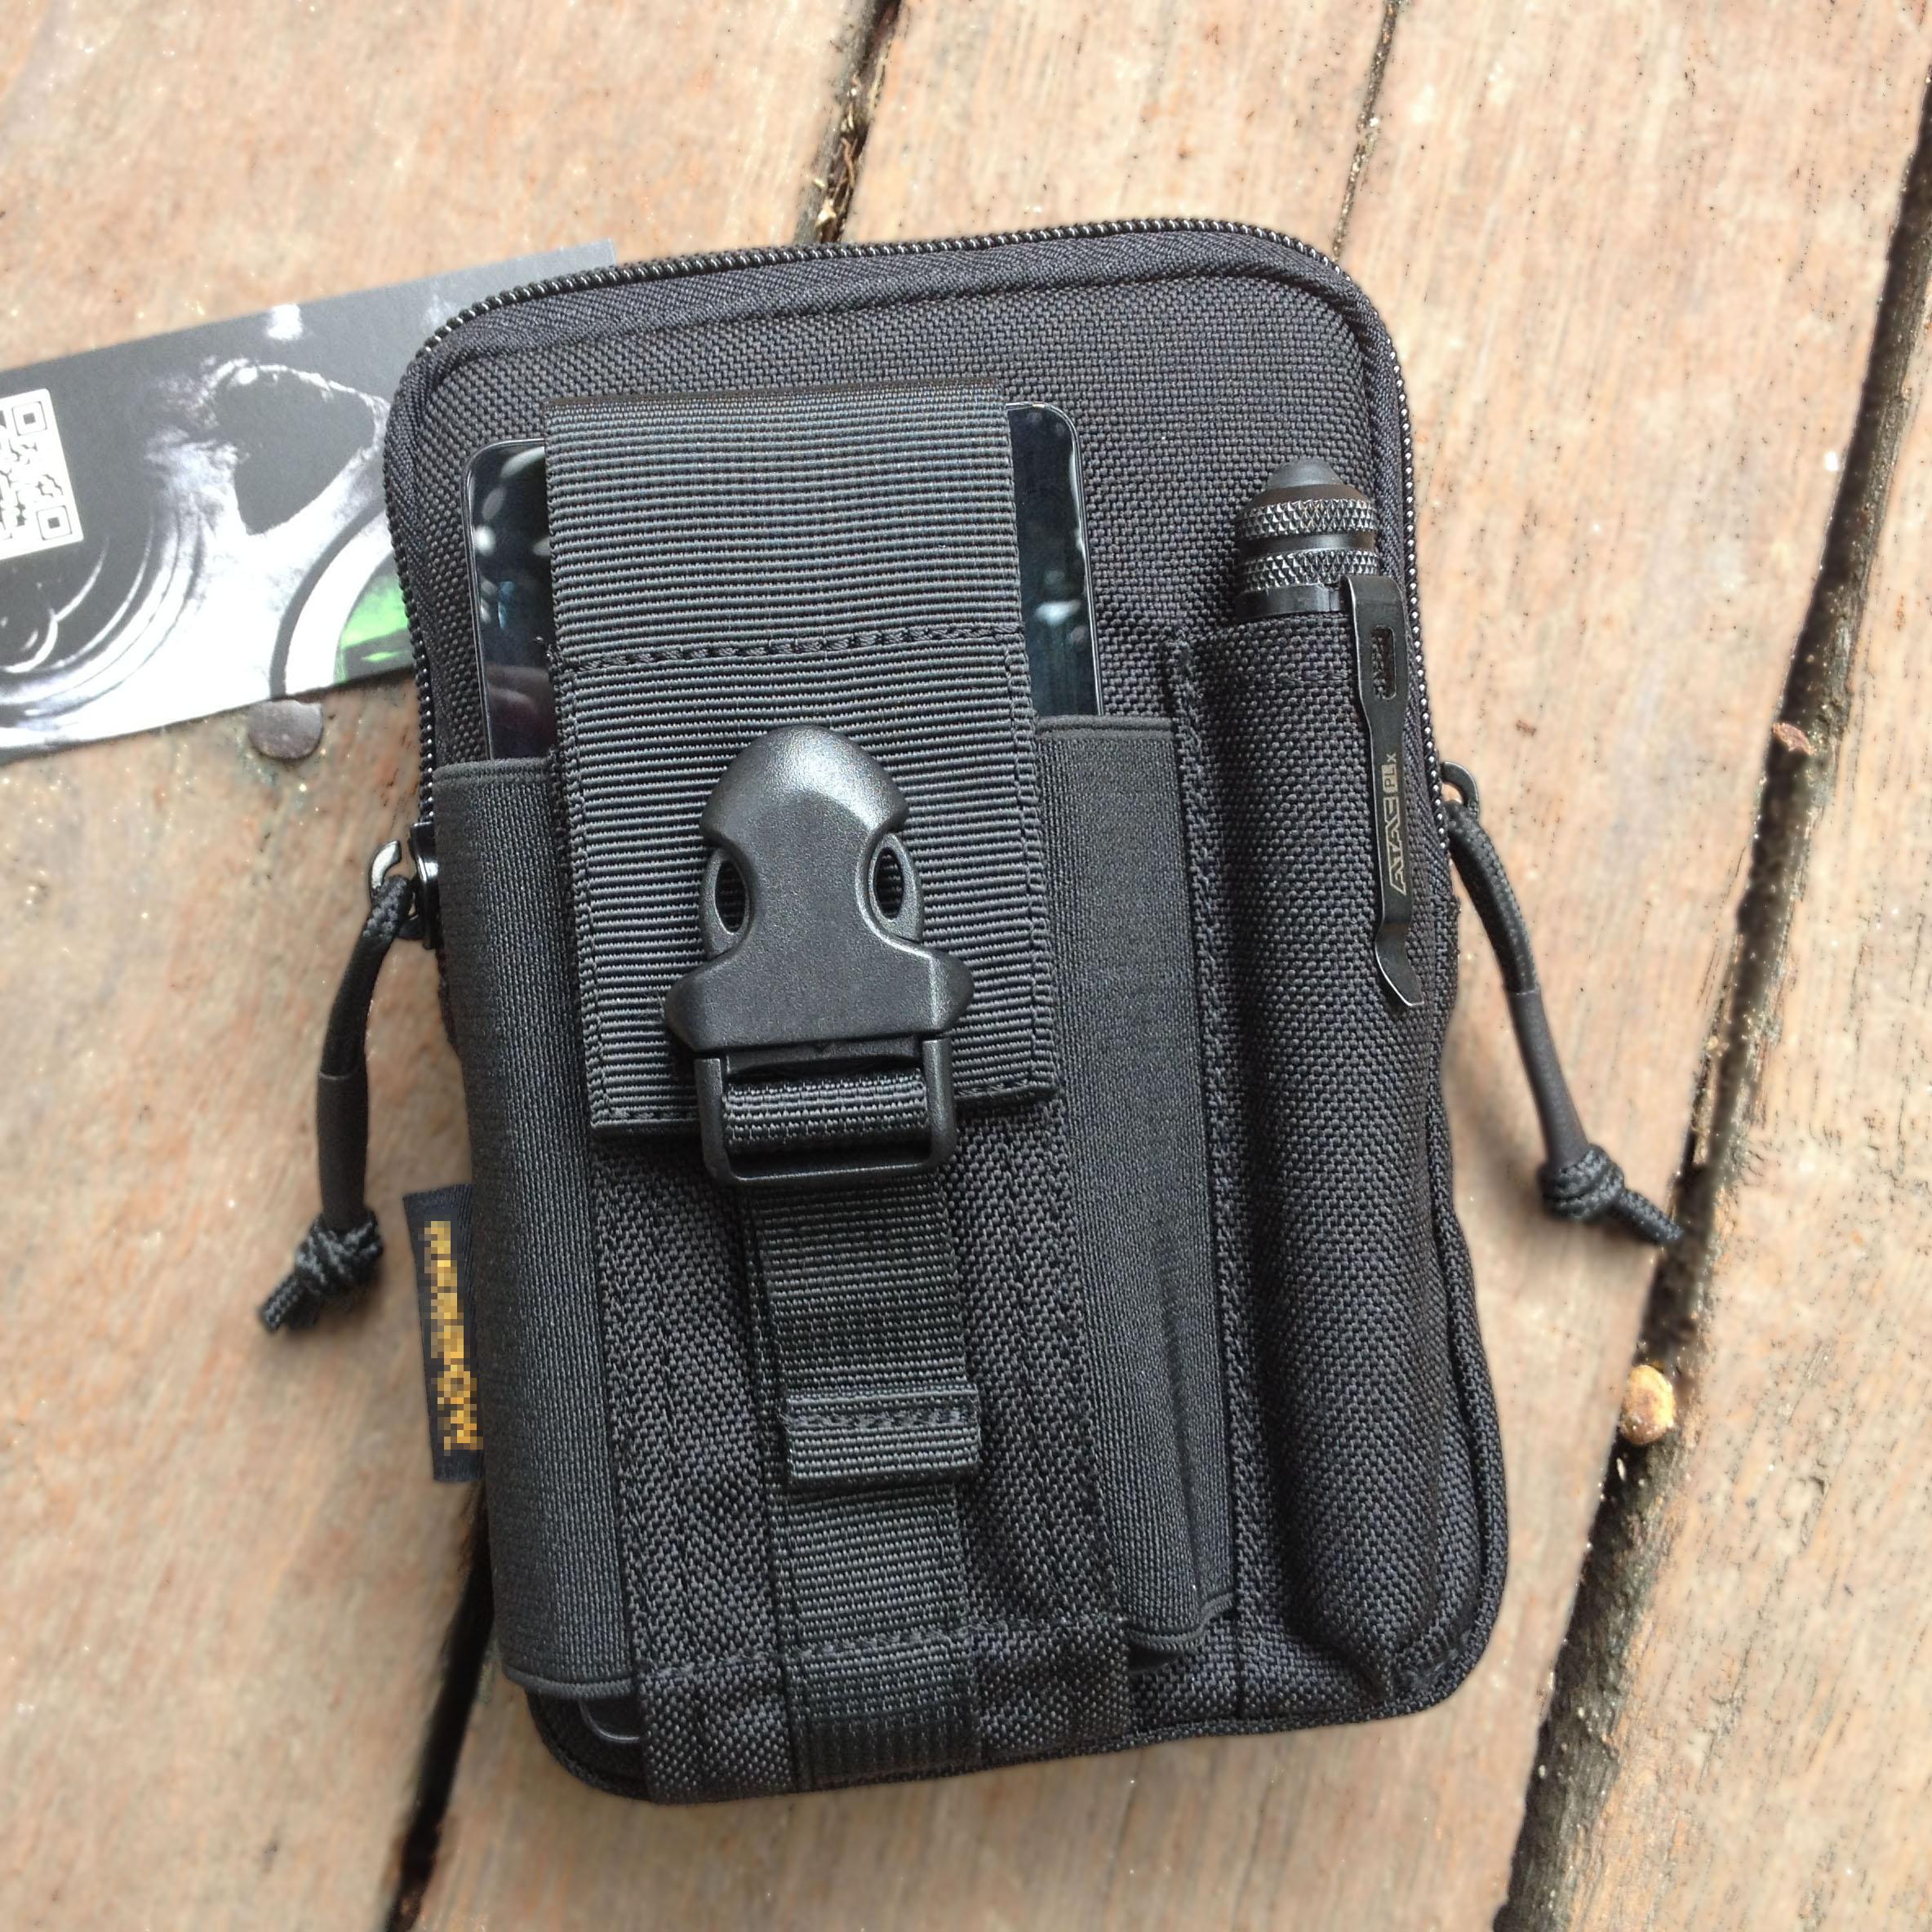 D30戰術腰包升級 運動腰包戰術手機包 可裝5.5寸手機iphon6 plus